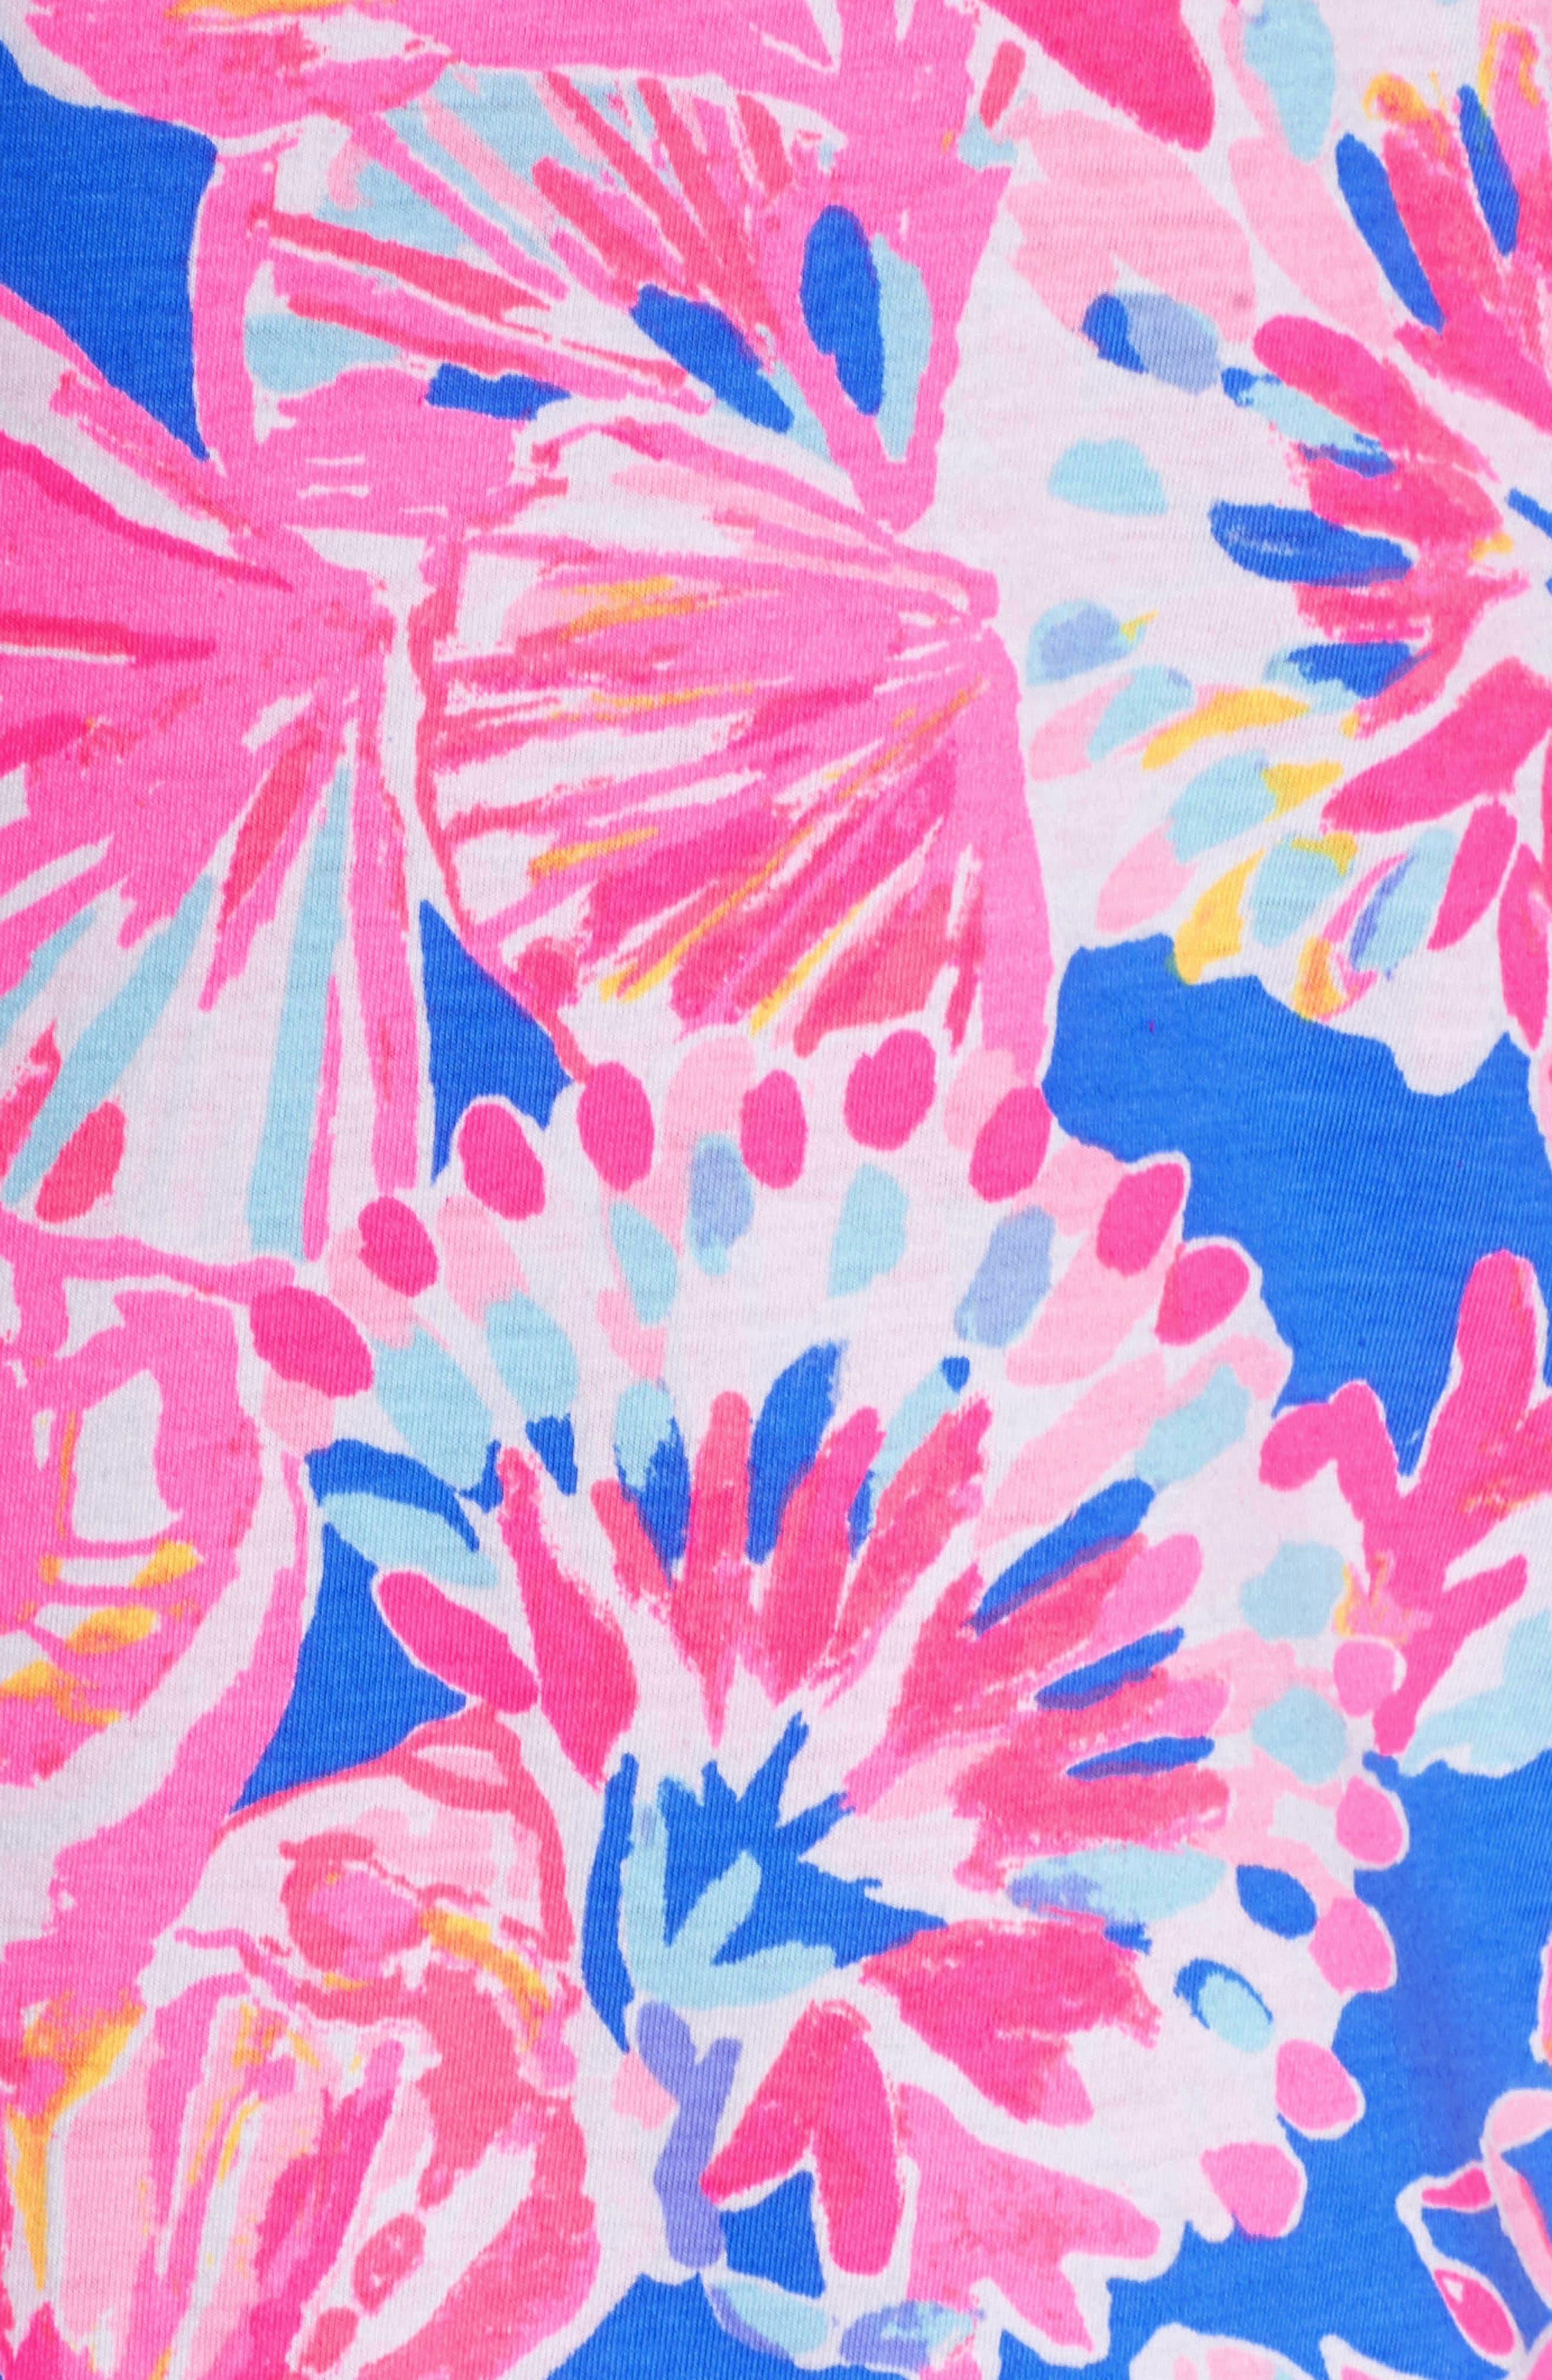 Noelle Floral Shift Dress,                             Alternate thumbnail 6, color,                             650